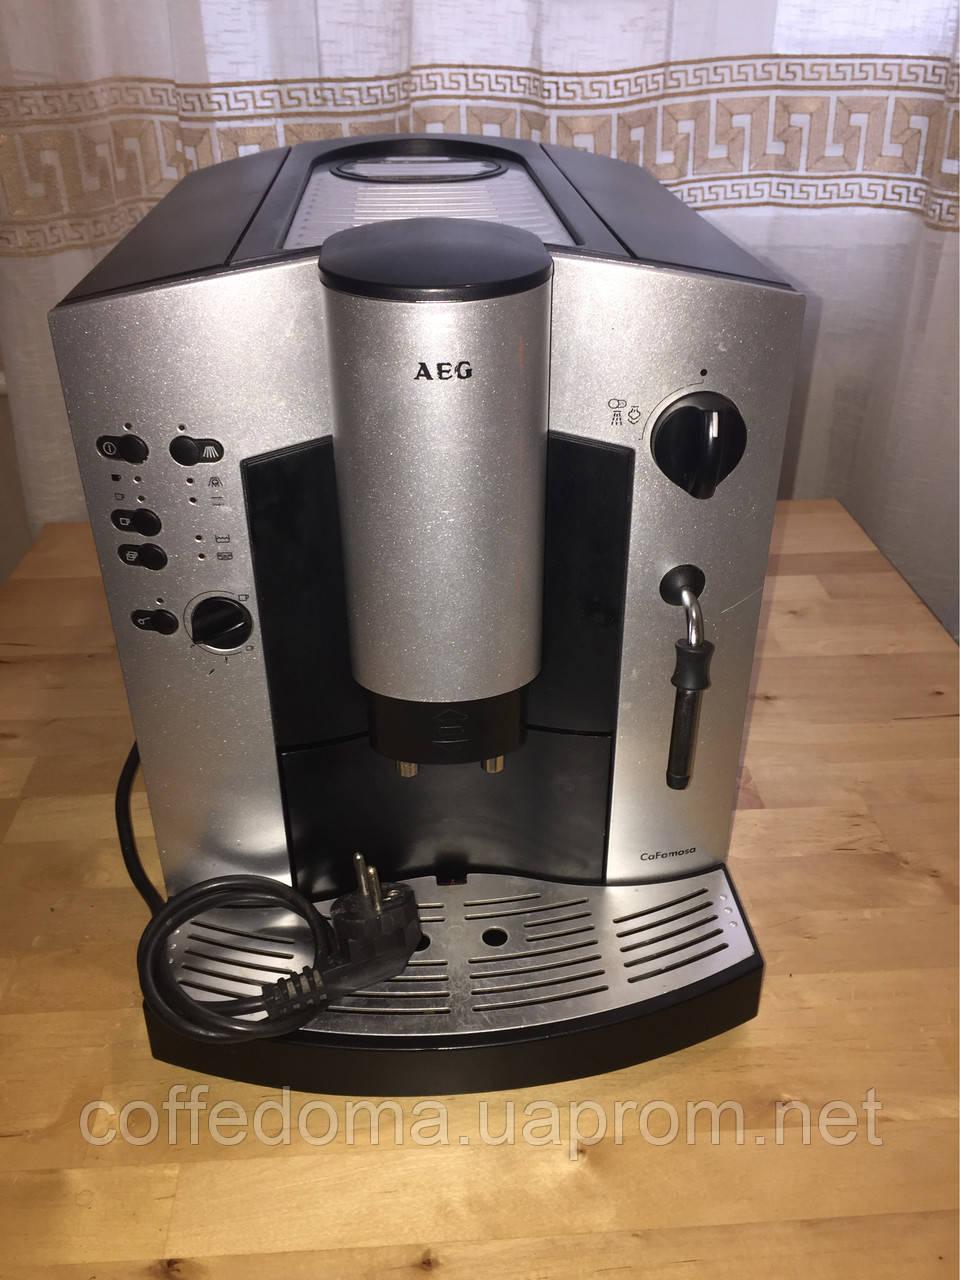 AEG Cafamosa CF 120 автоматическая кофемашина